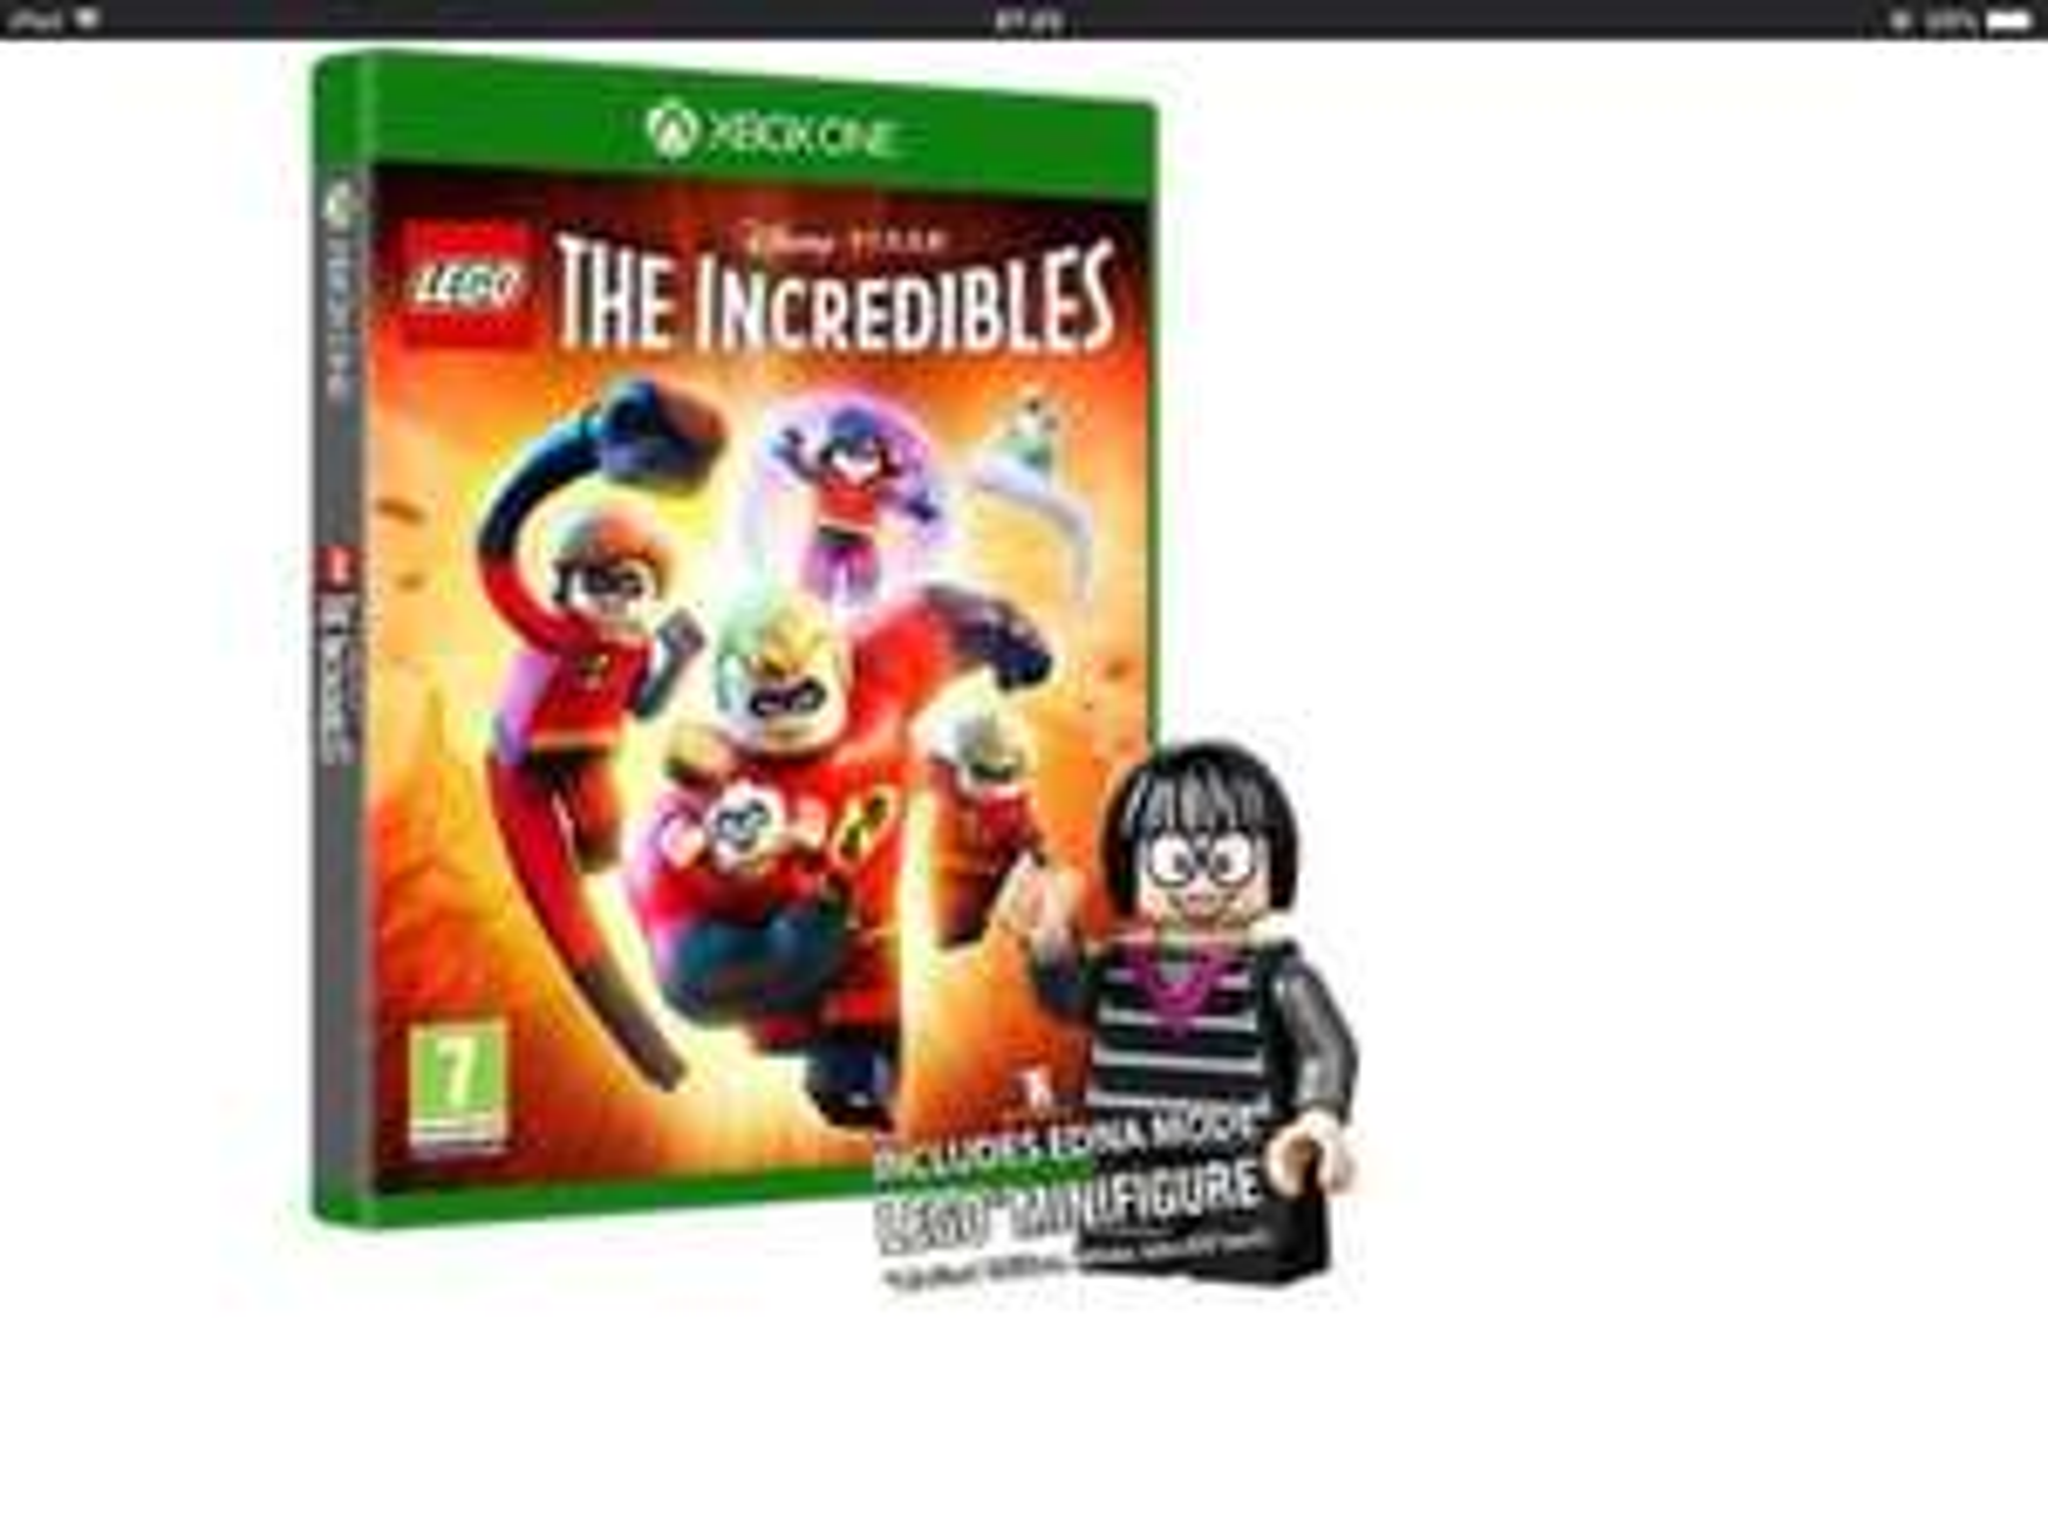 Lego The Incredibles Xbox One Inc Edna  Mini Figurine Xbox One and PS4  shopto eBay - £29.85